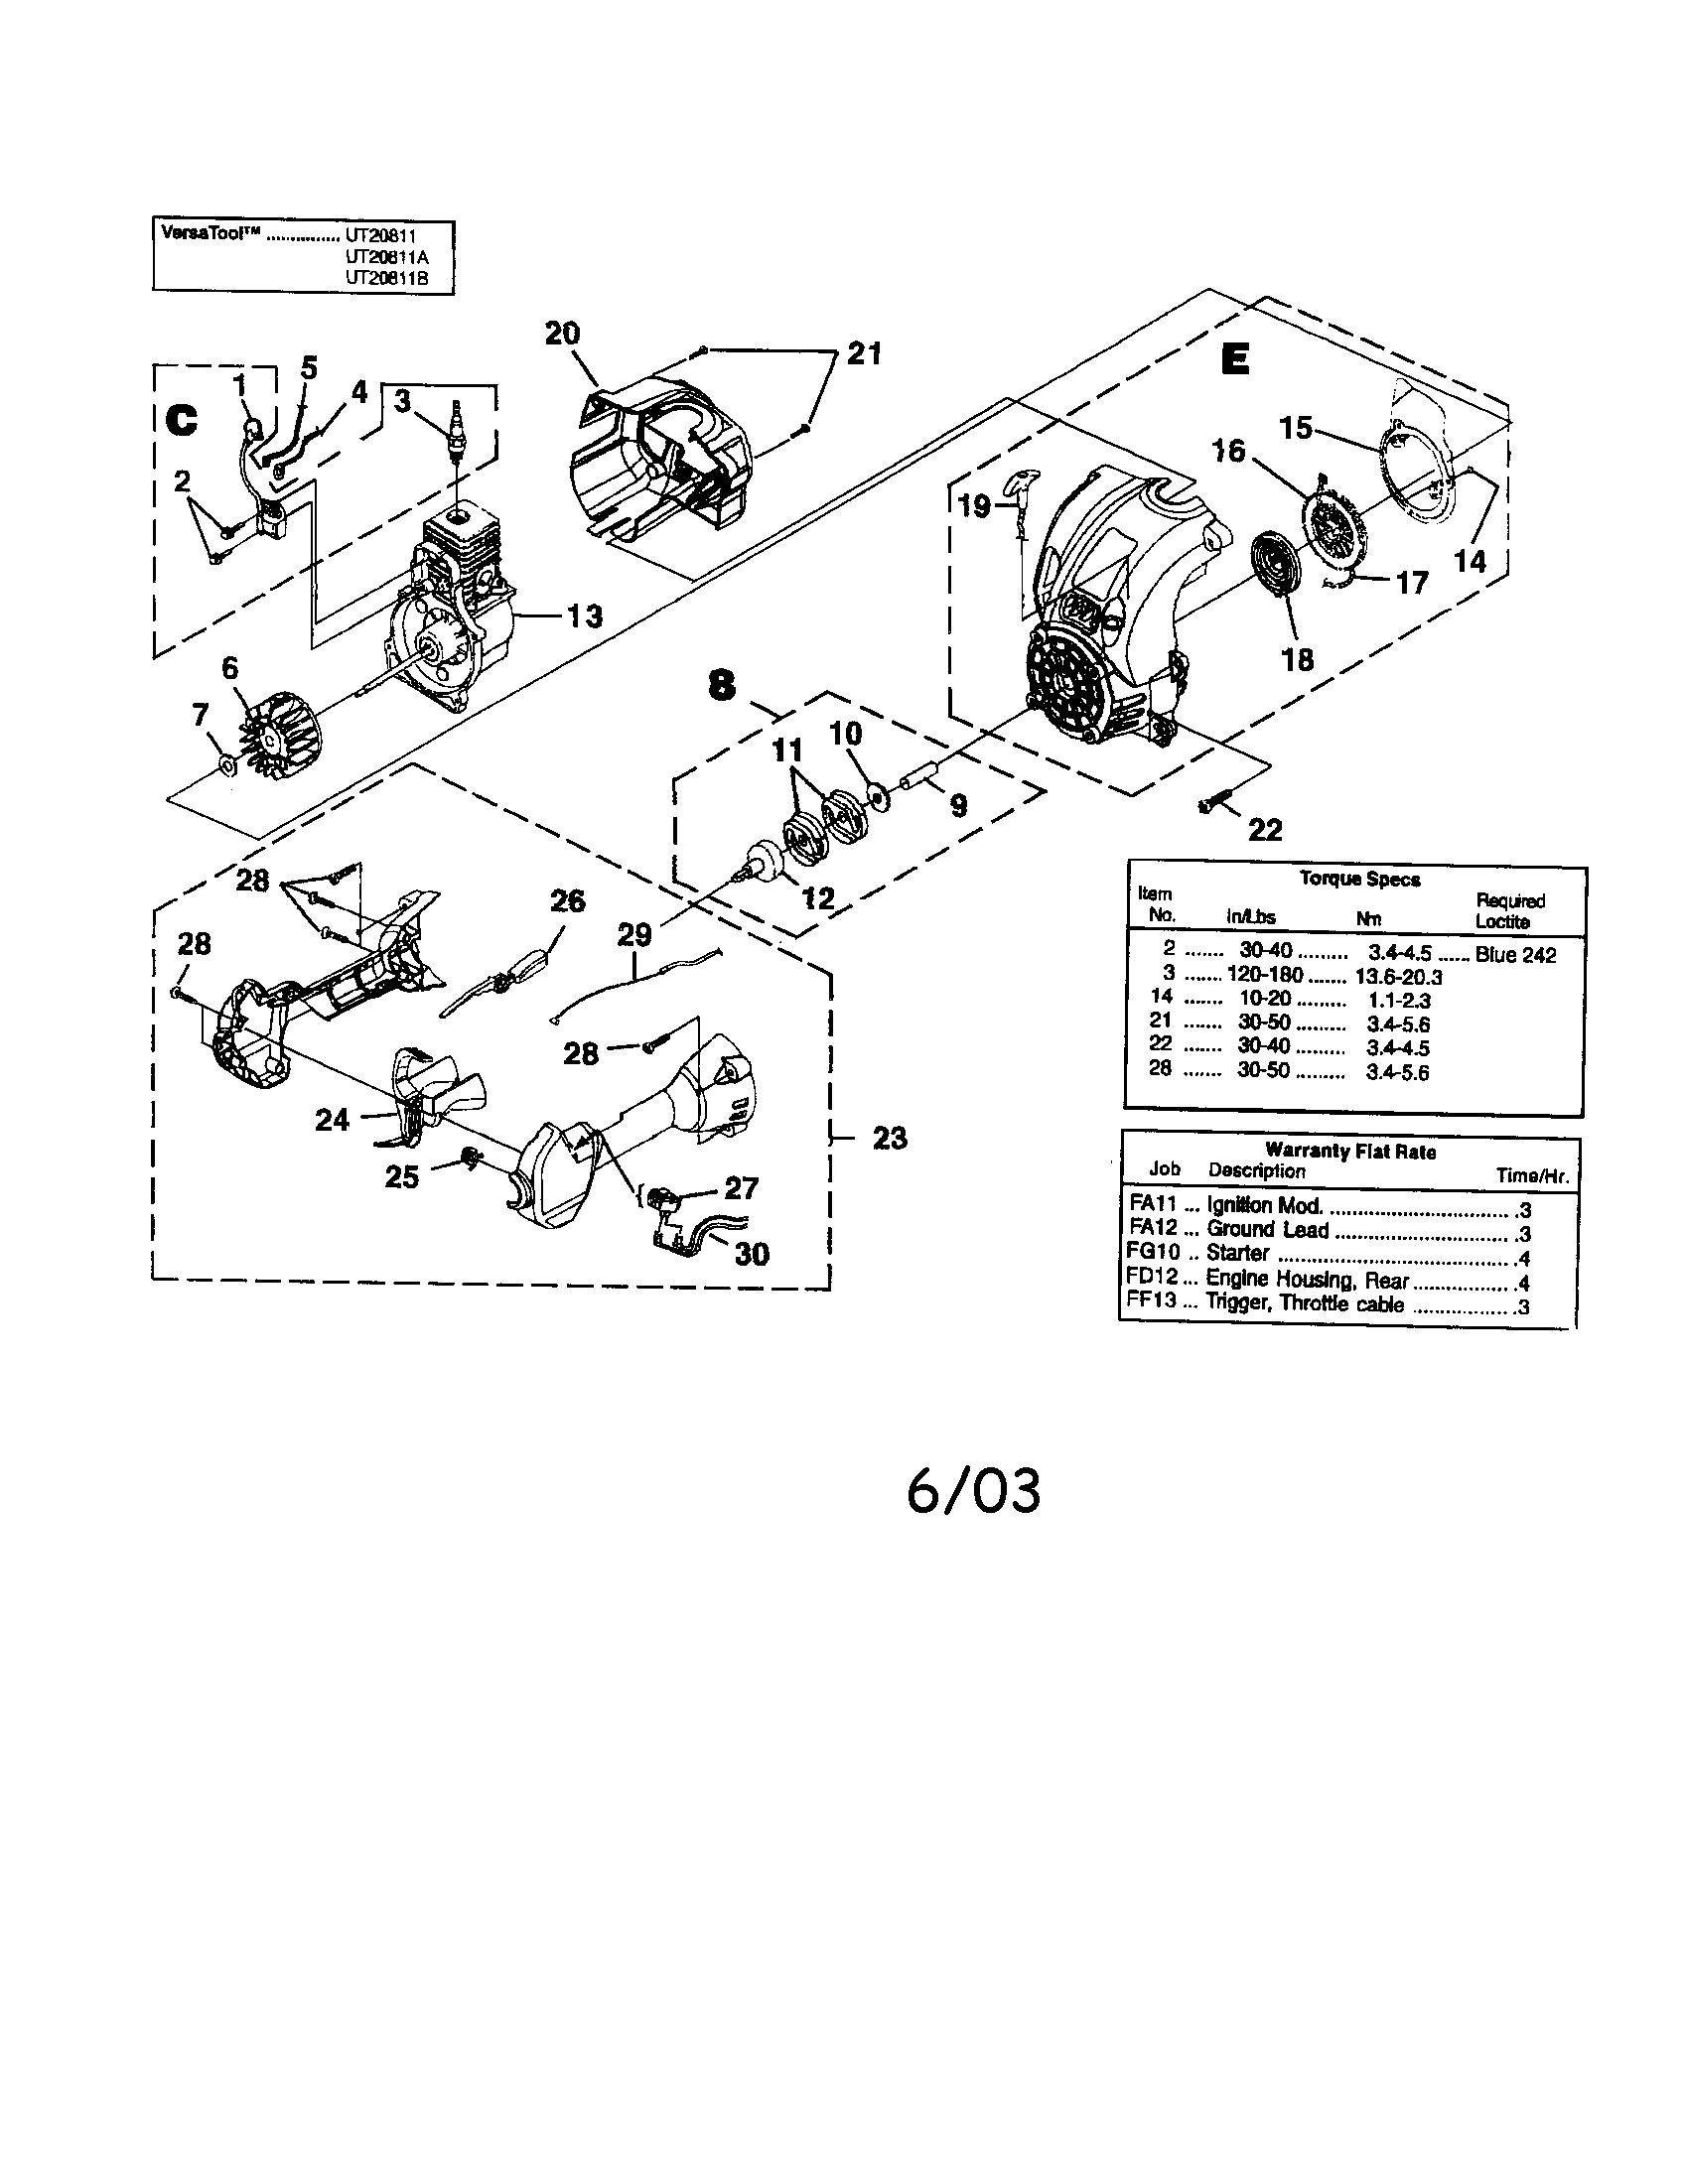 Homelite model UT20811 line trimmers/weedwackers, gas